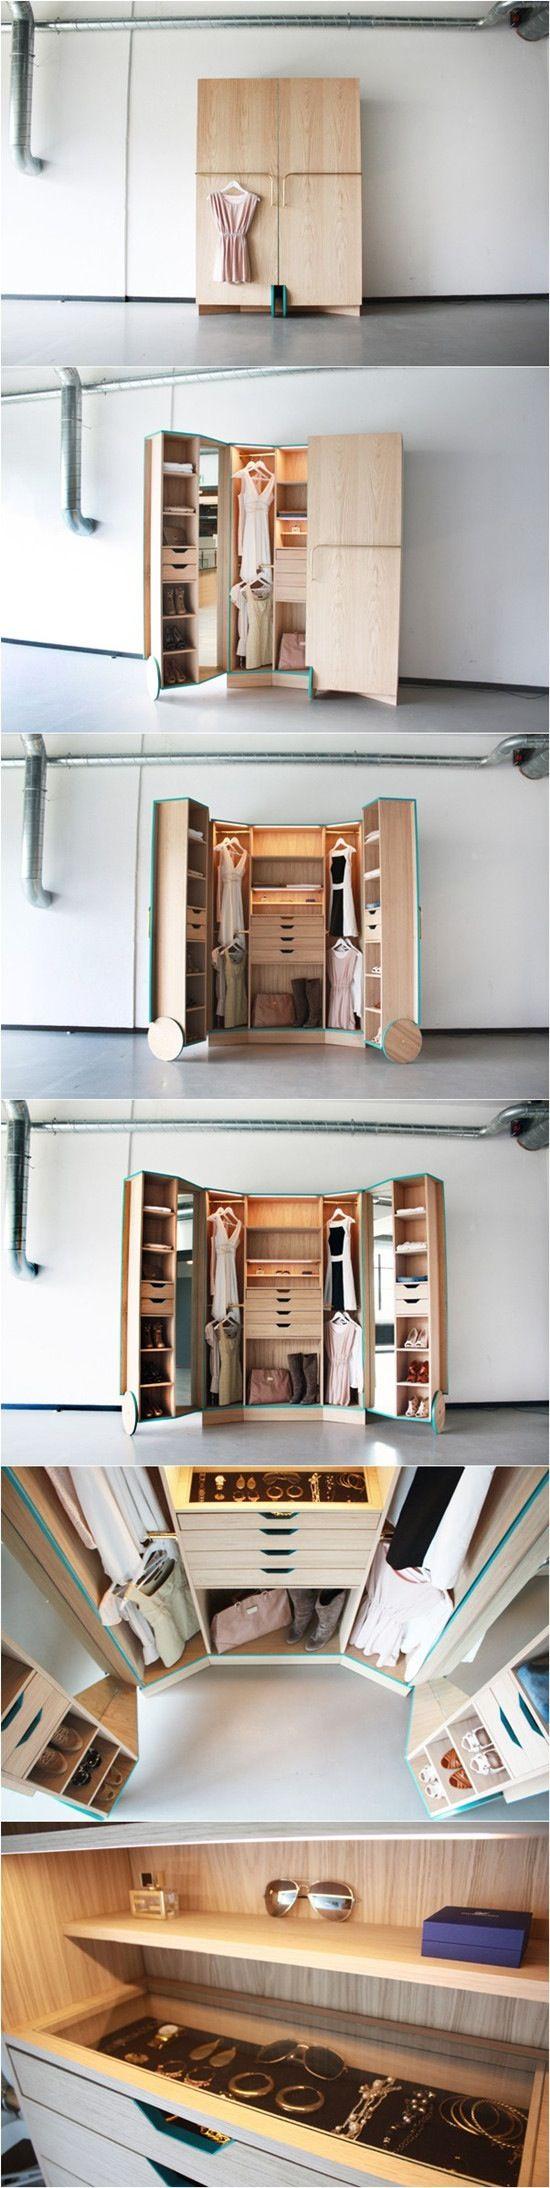 supercute walk in wardrobe :)